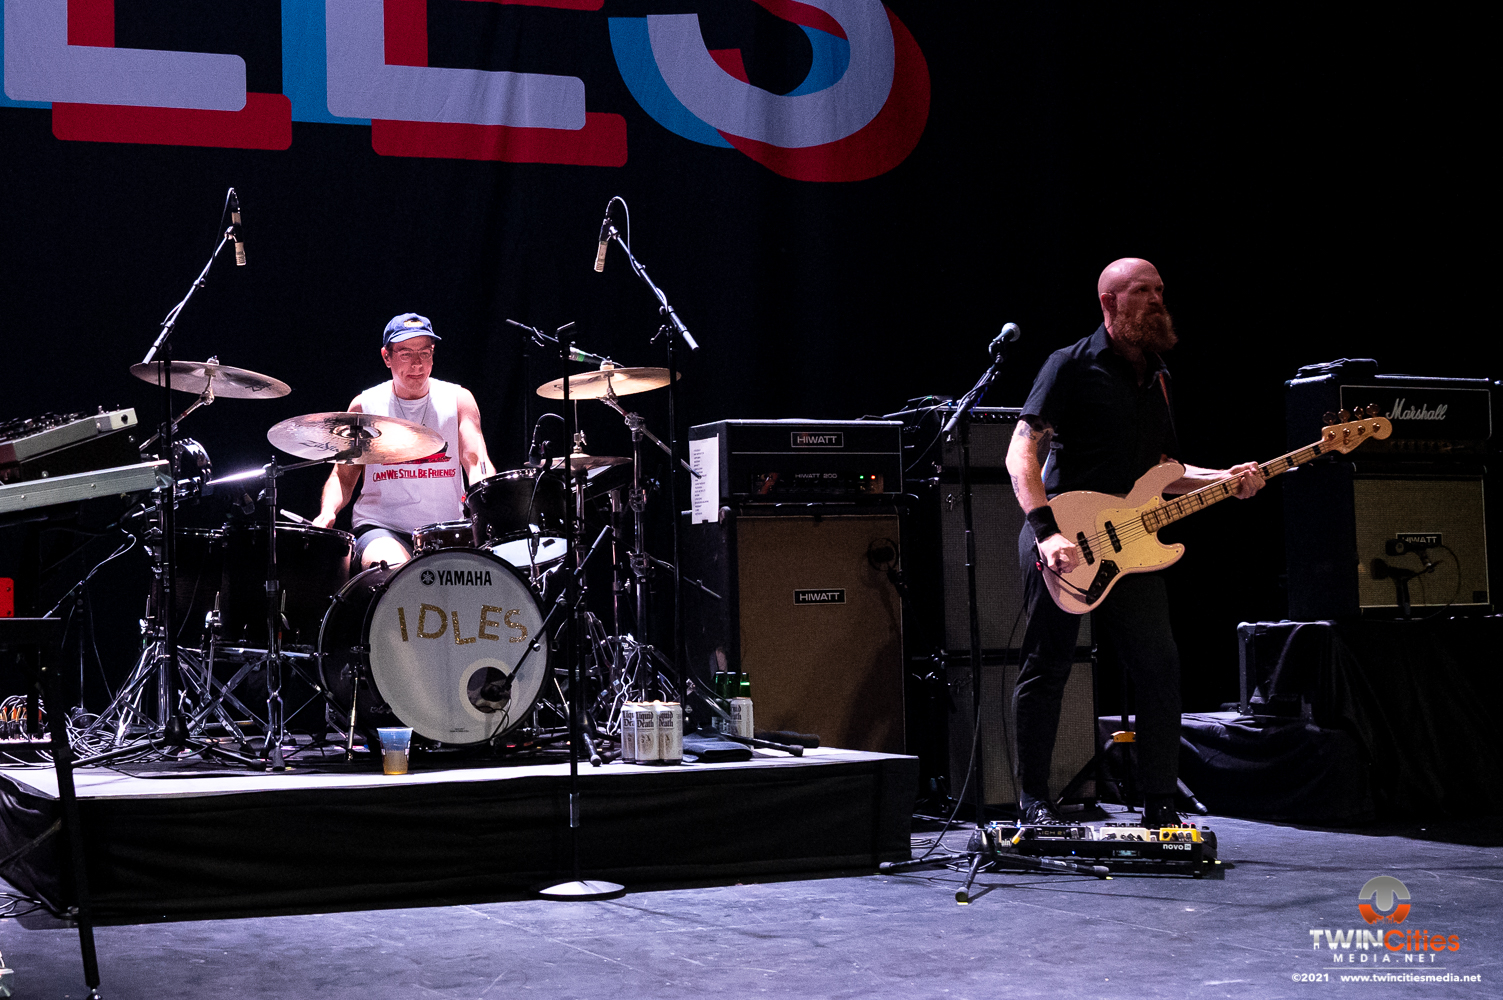 Idles-2